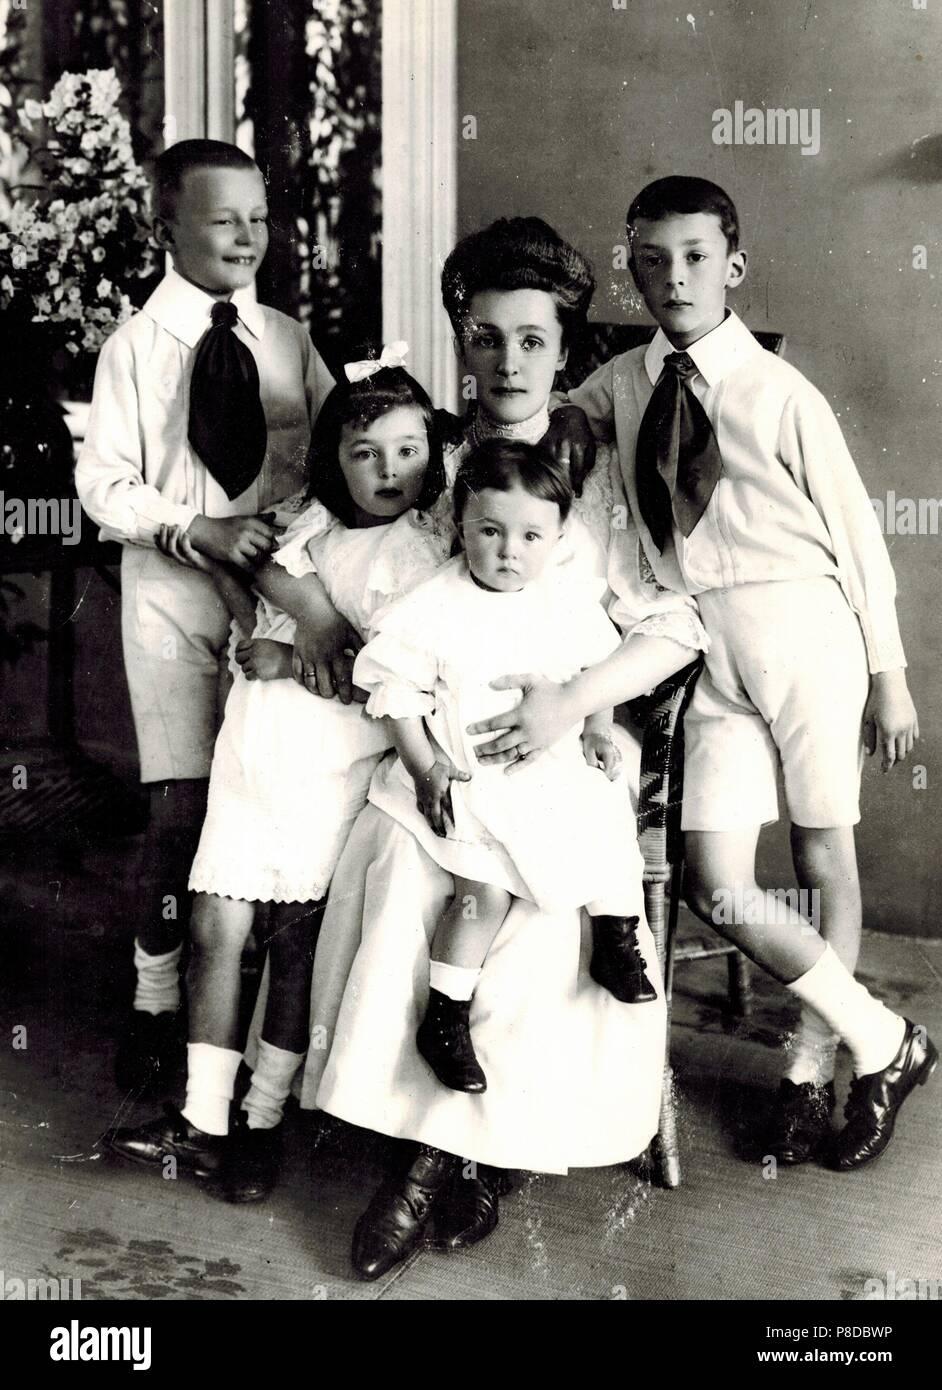 Elena Ivanovna Nabokova with children Sergei, Olga, Elena and Vladimir. Museum: PRIVATE COLLECTION. - Stock Image